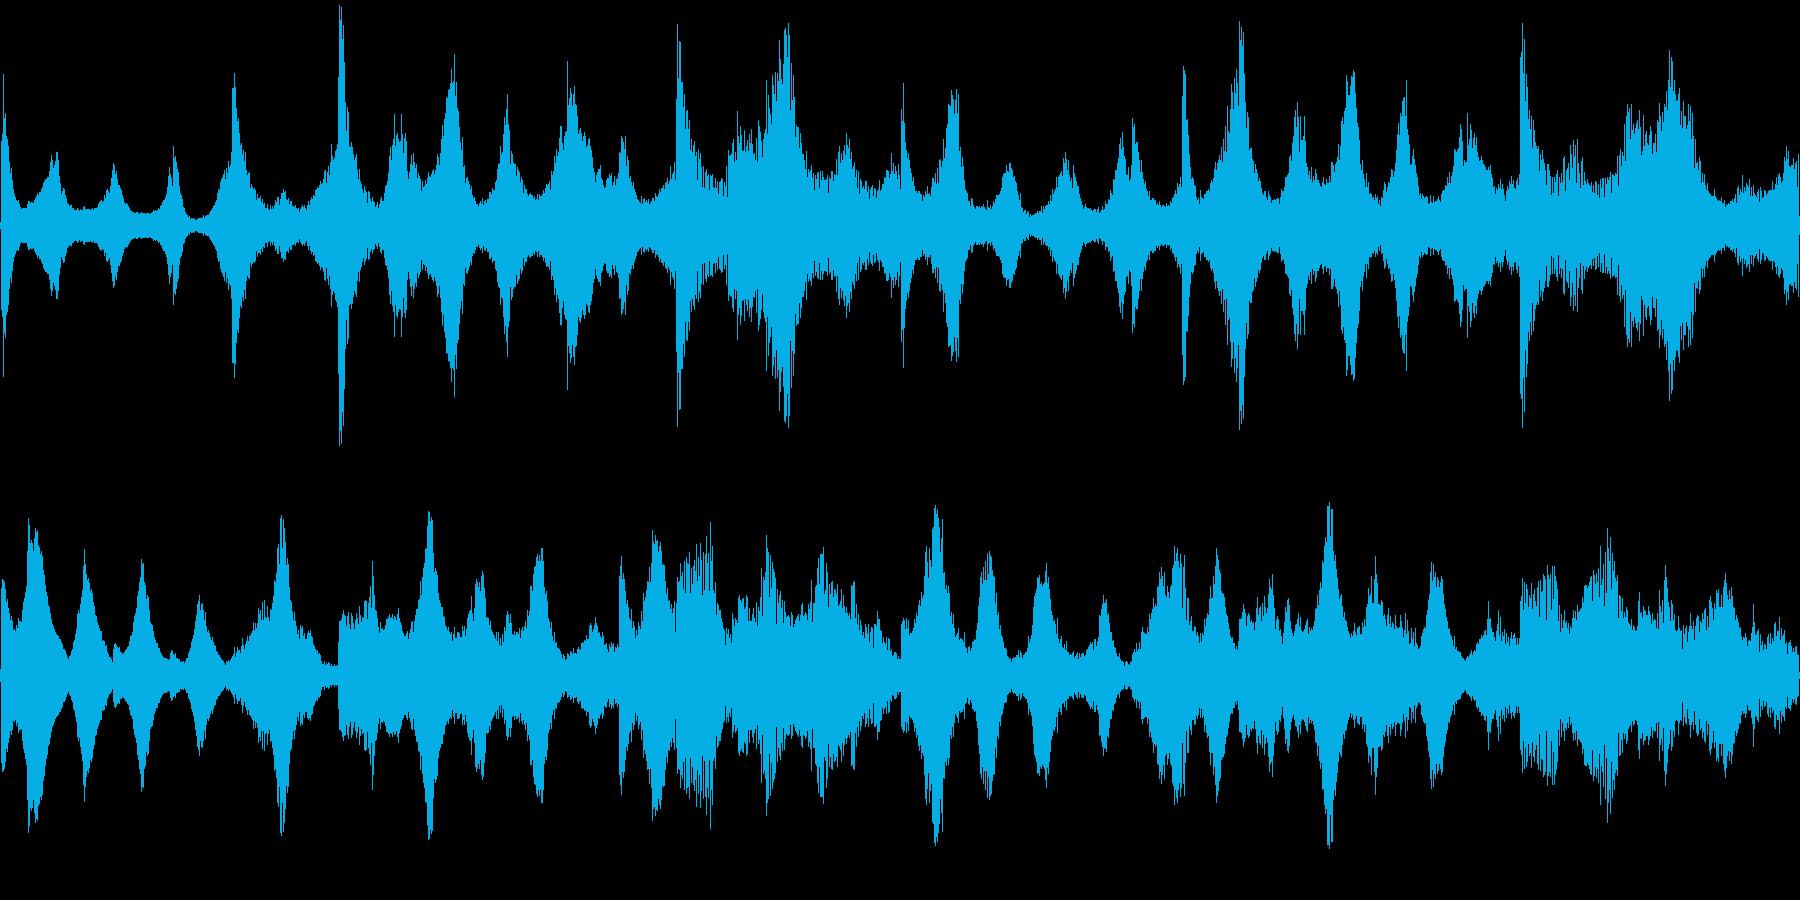 k007 アラーム音(ループ仕様)の再生済みの波形